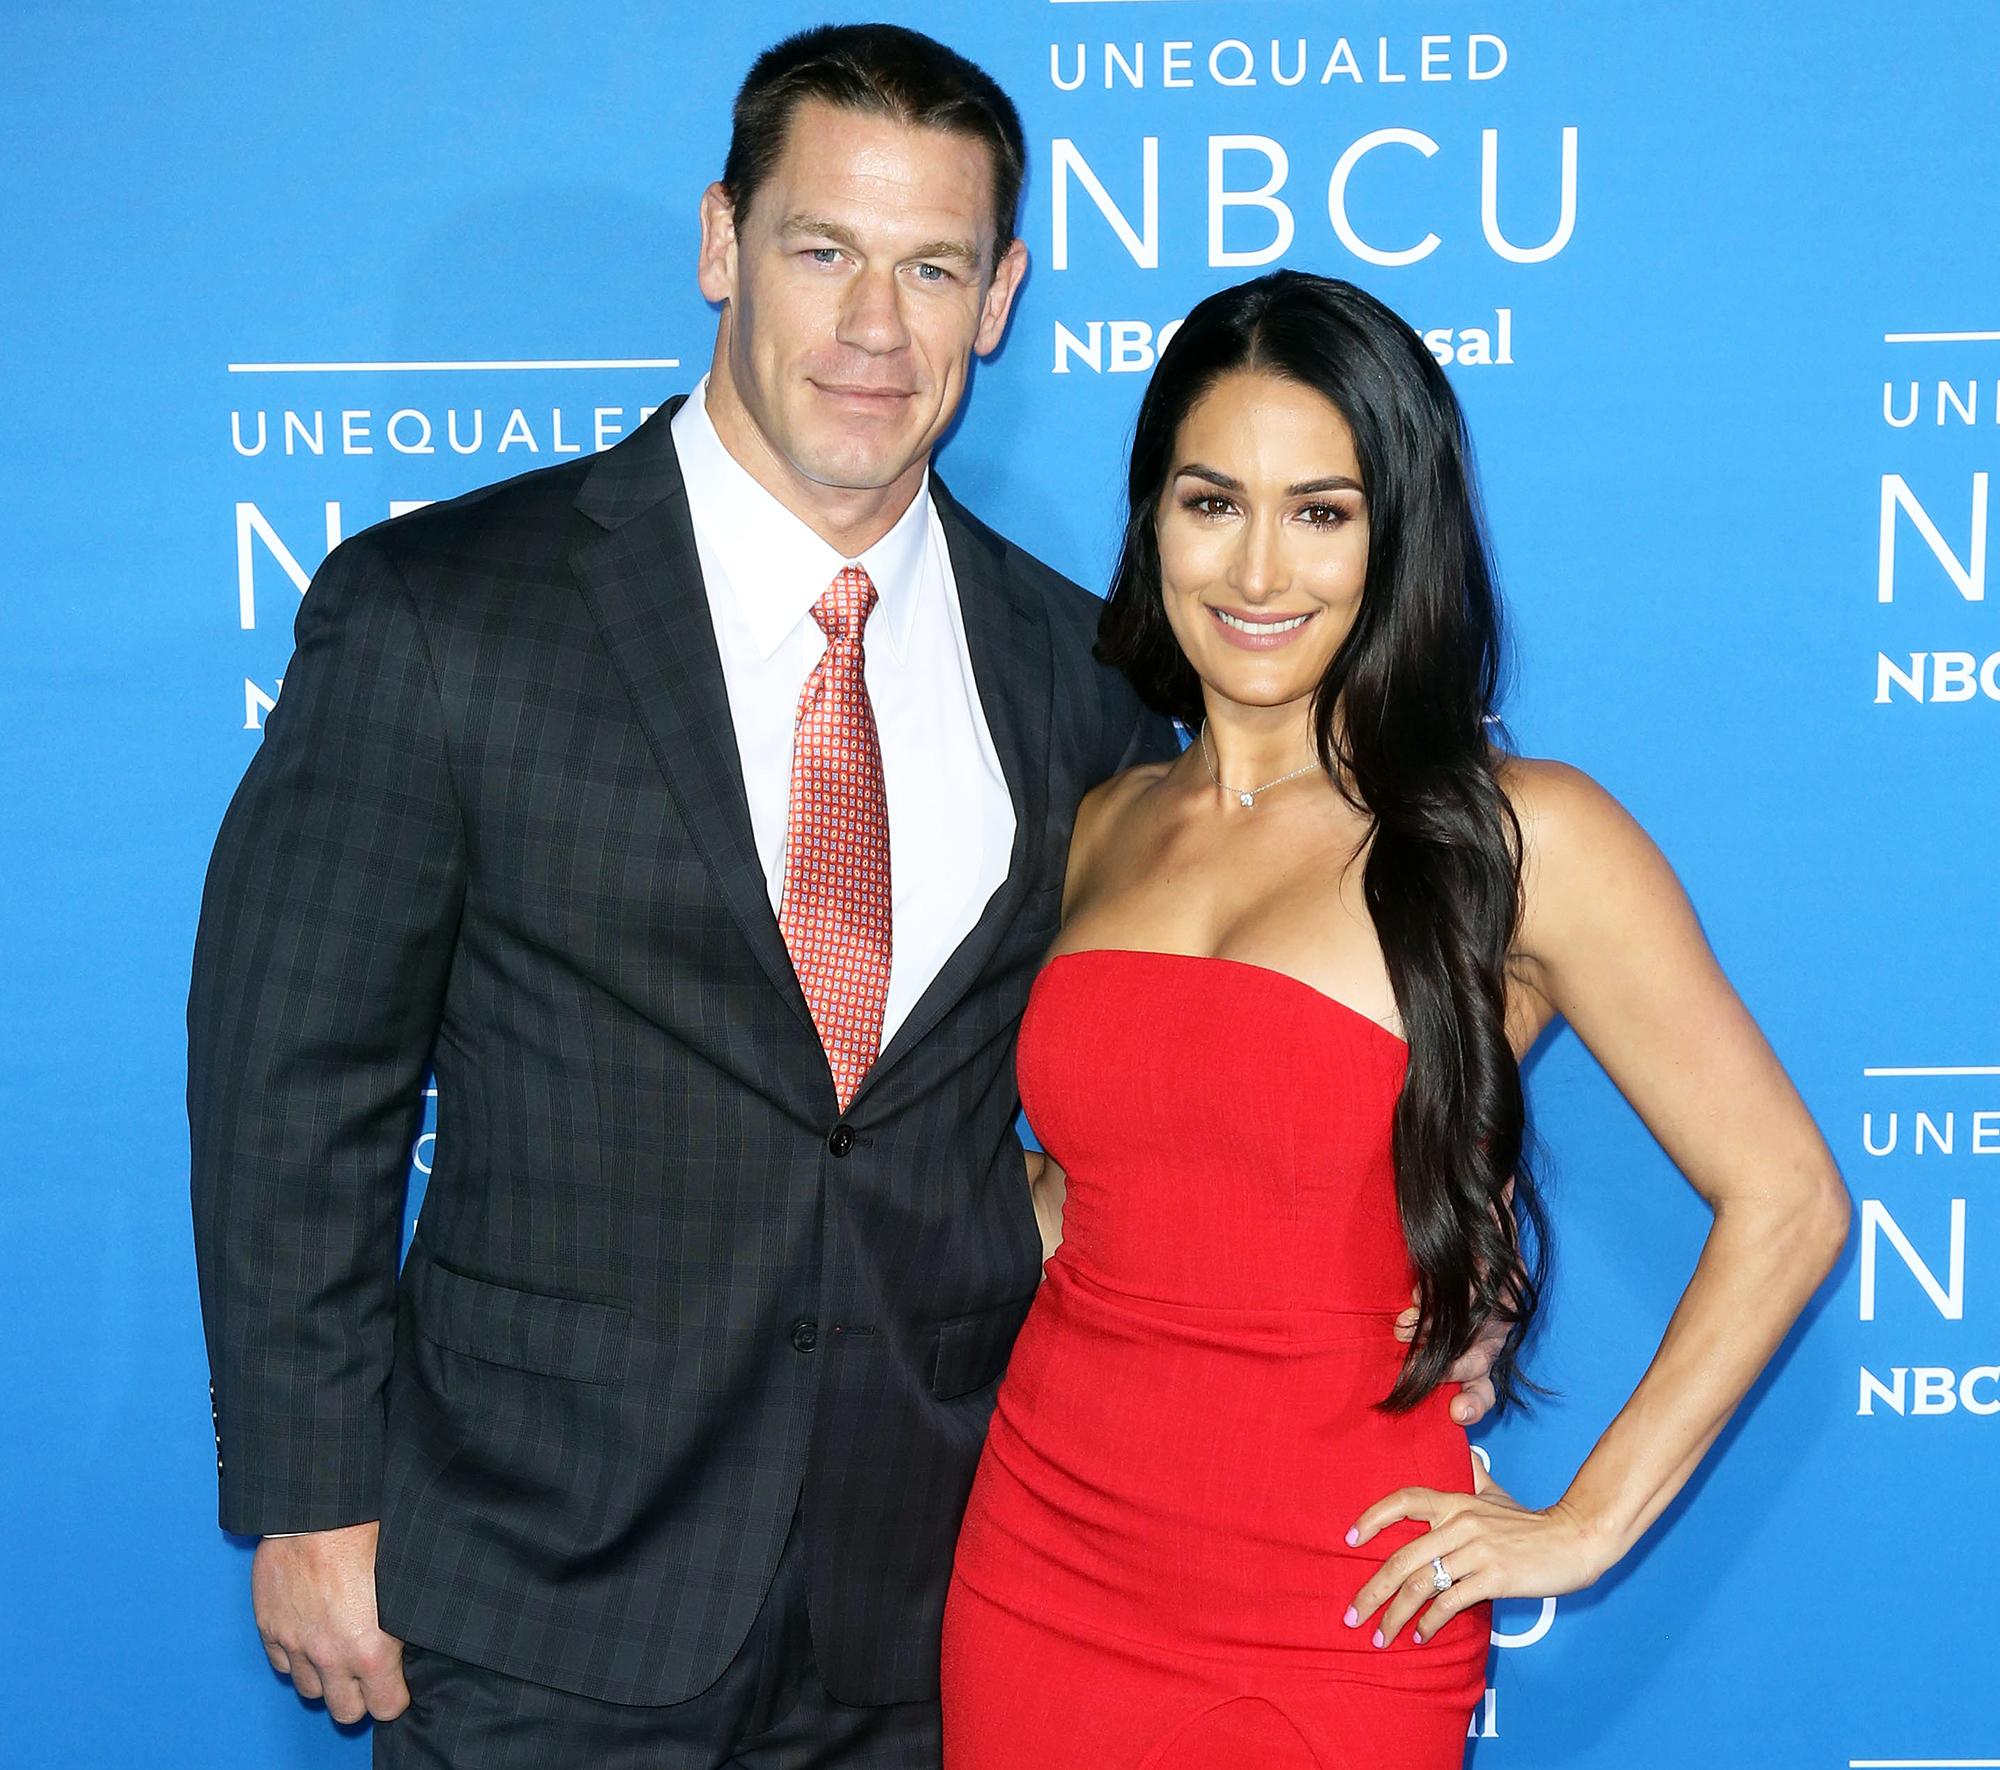 John Cena Nikki Bella Concerned